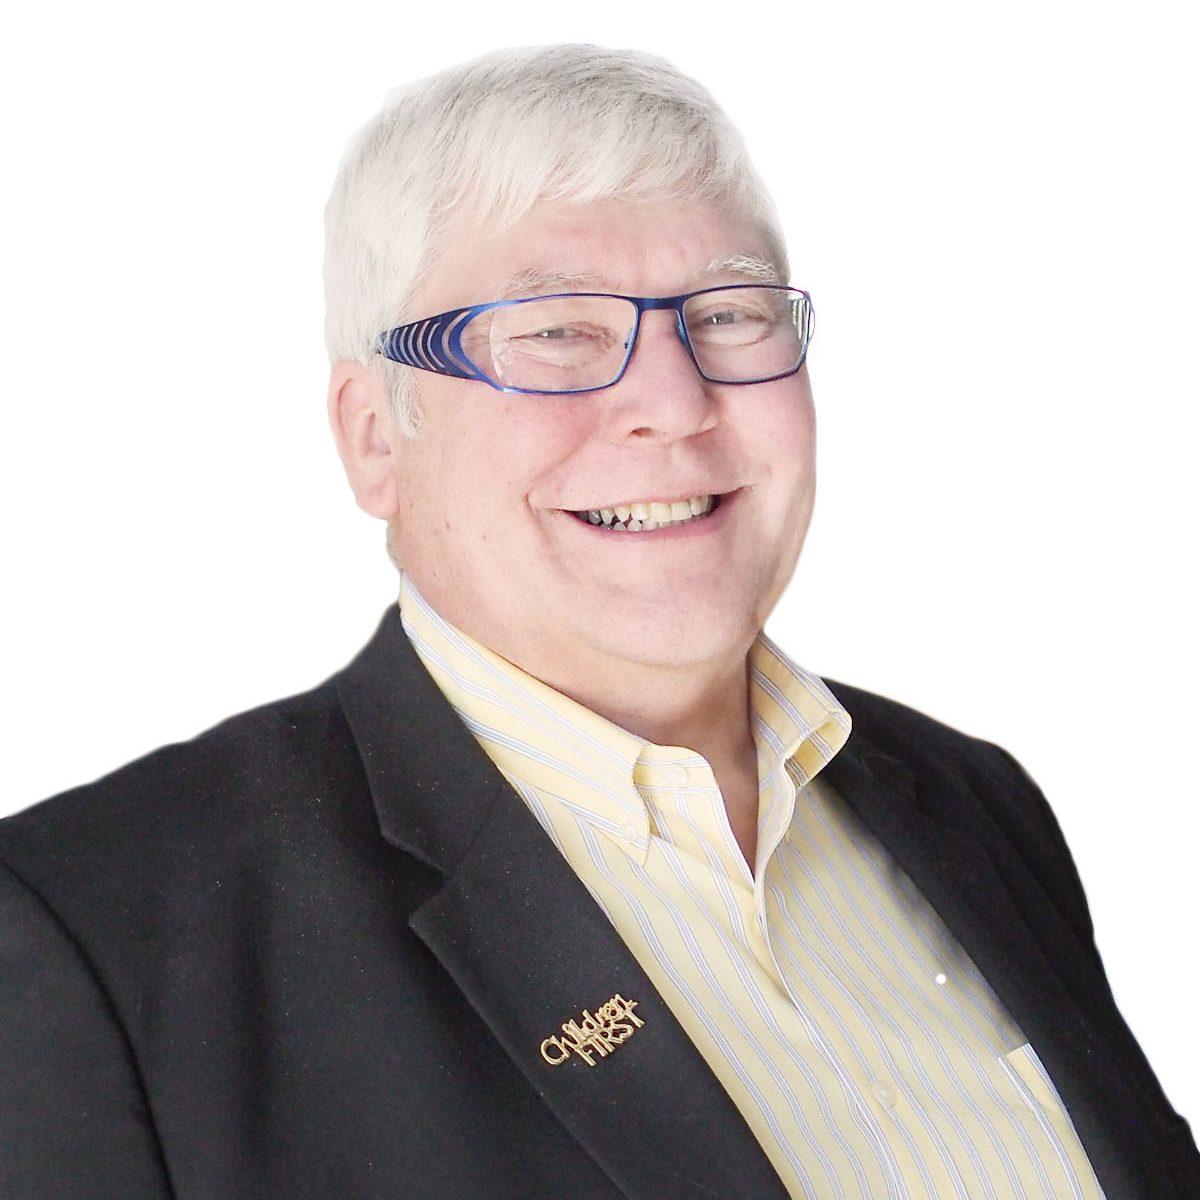 Hon. Judge Dave Hancock